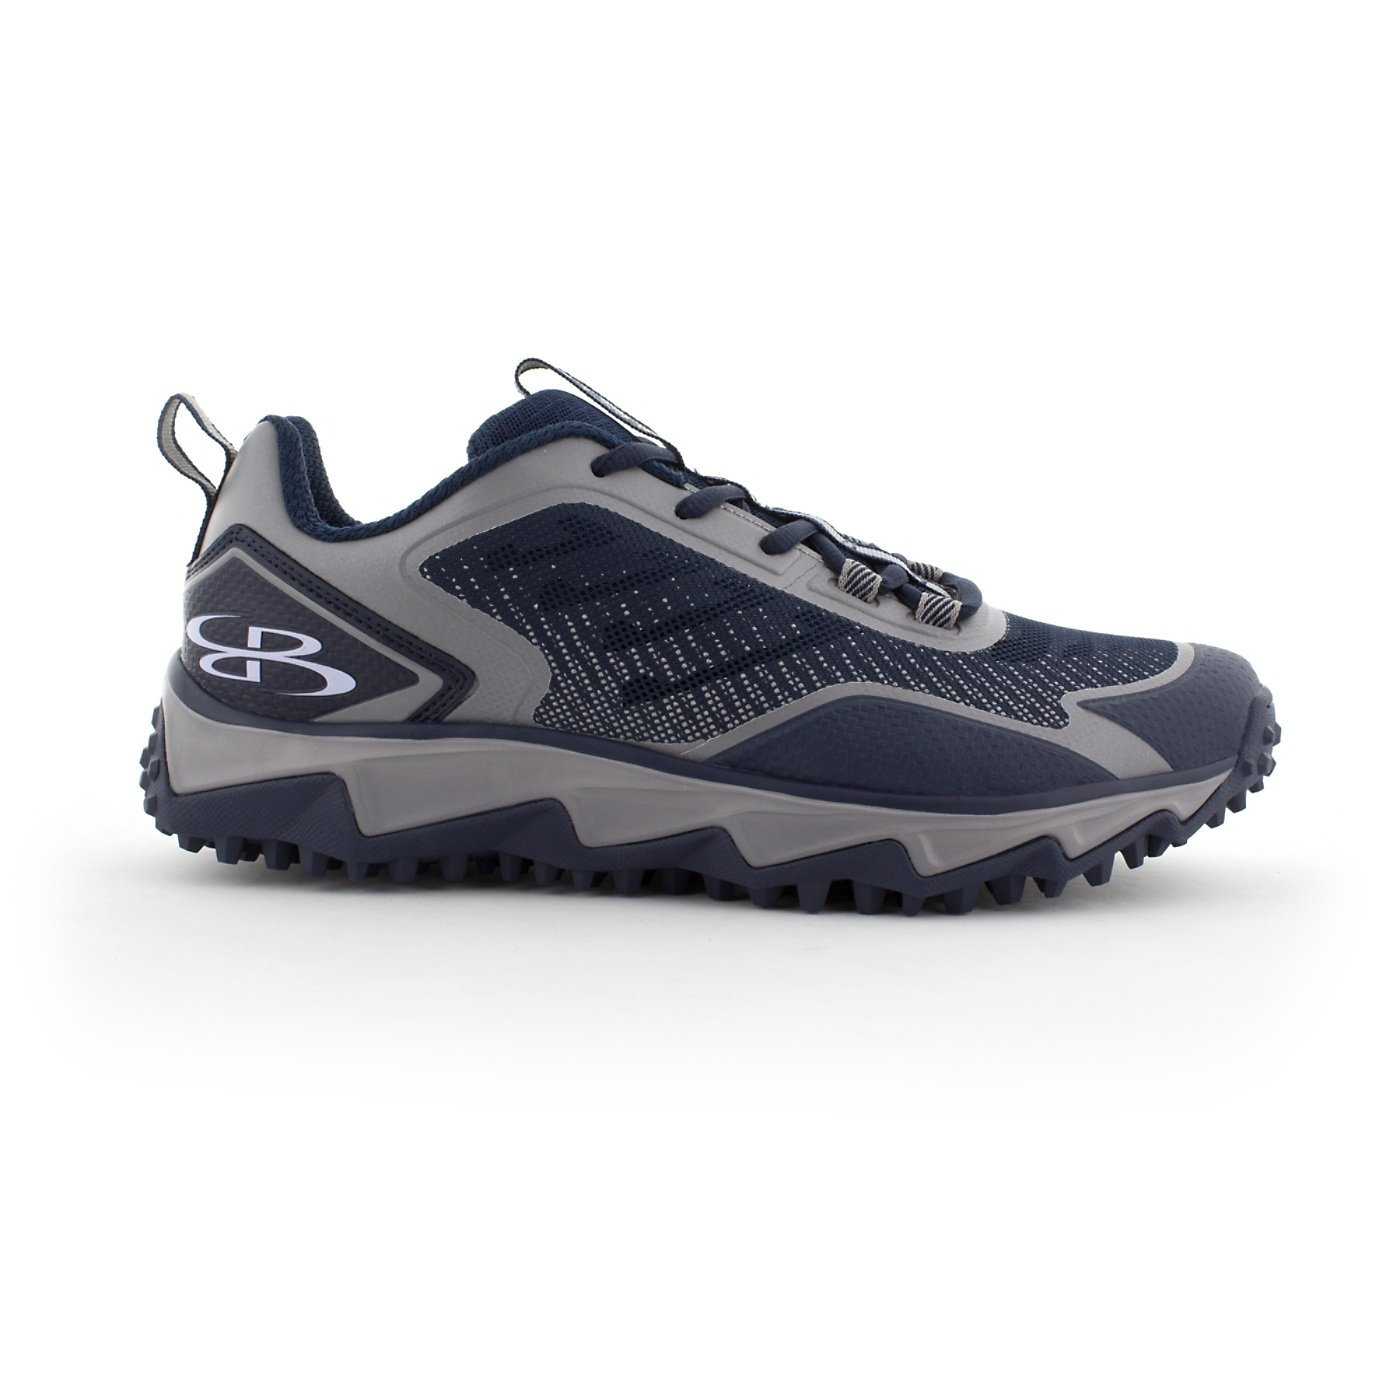 BoombahメンズBerzerk Turf Shoes – 13色オプション – 複数のサイズ B0769WYNXN 9|ネイビー/グレー ネイビー/グレー 9